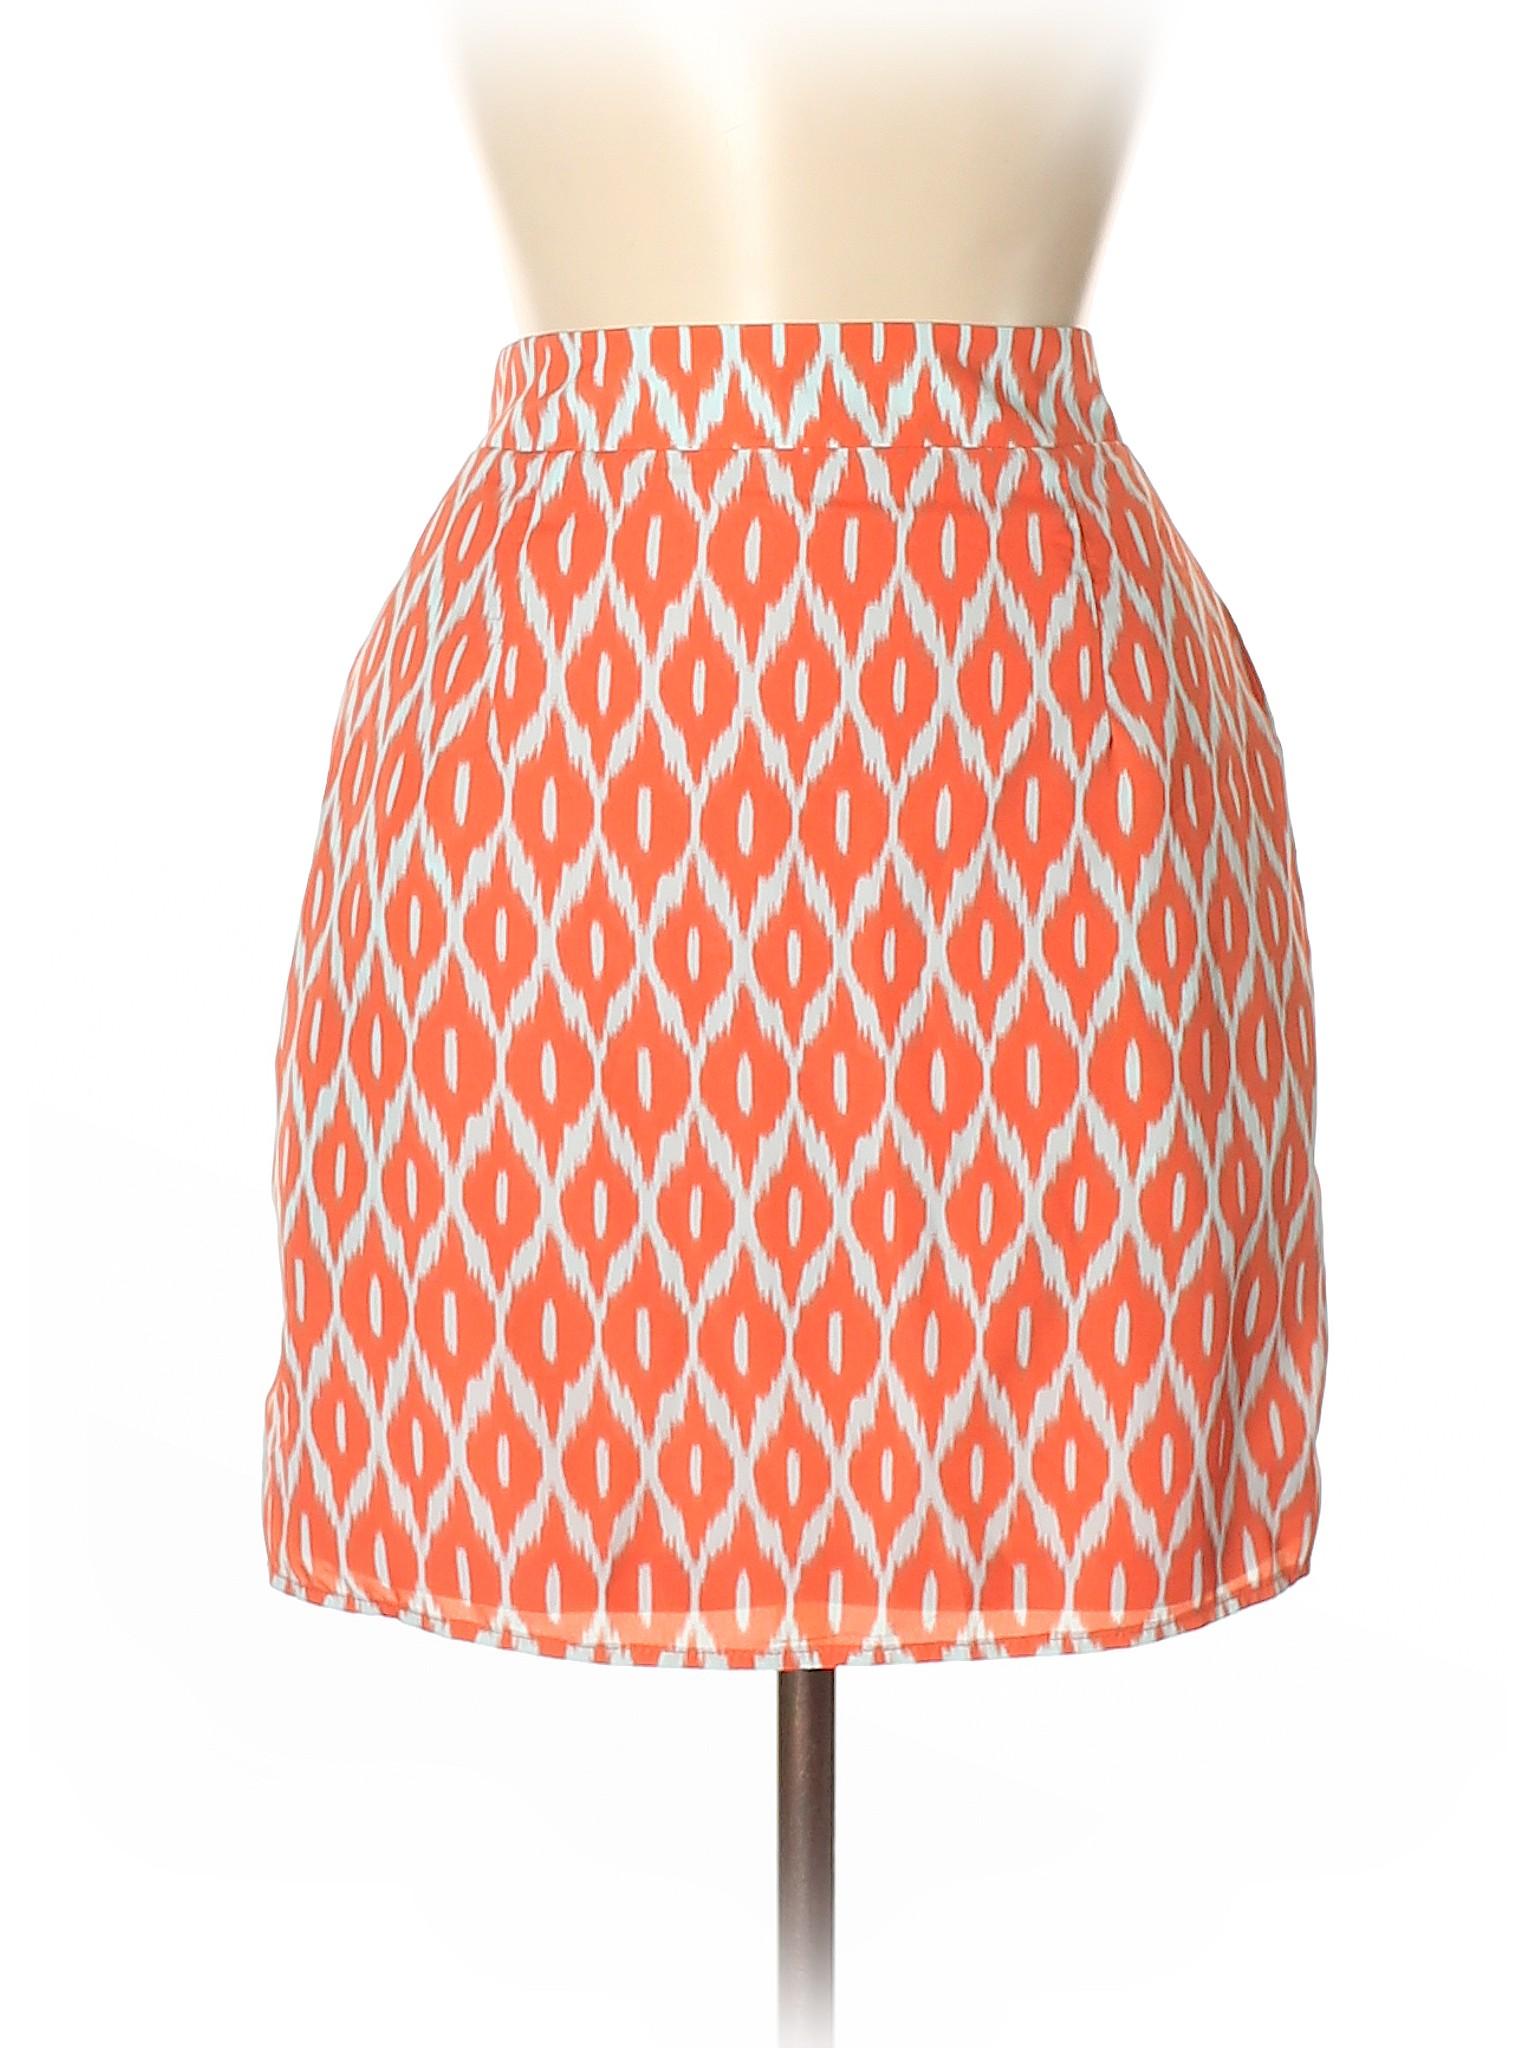 Annabella Casual Skirt Boutique Boutique Annabella Casual Boutique Skirt Xgwgxqtf8